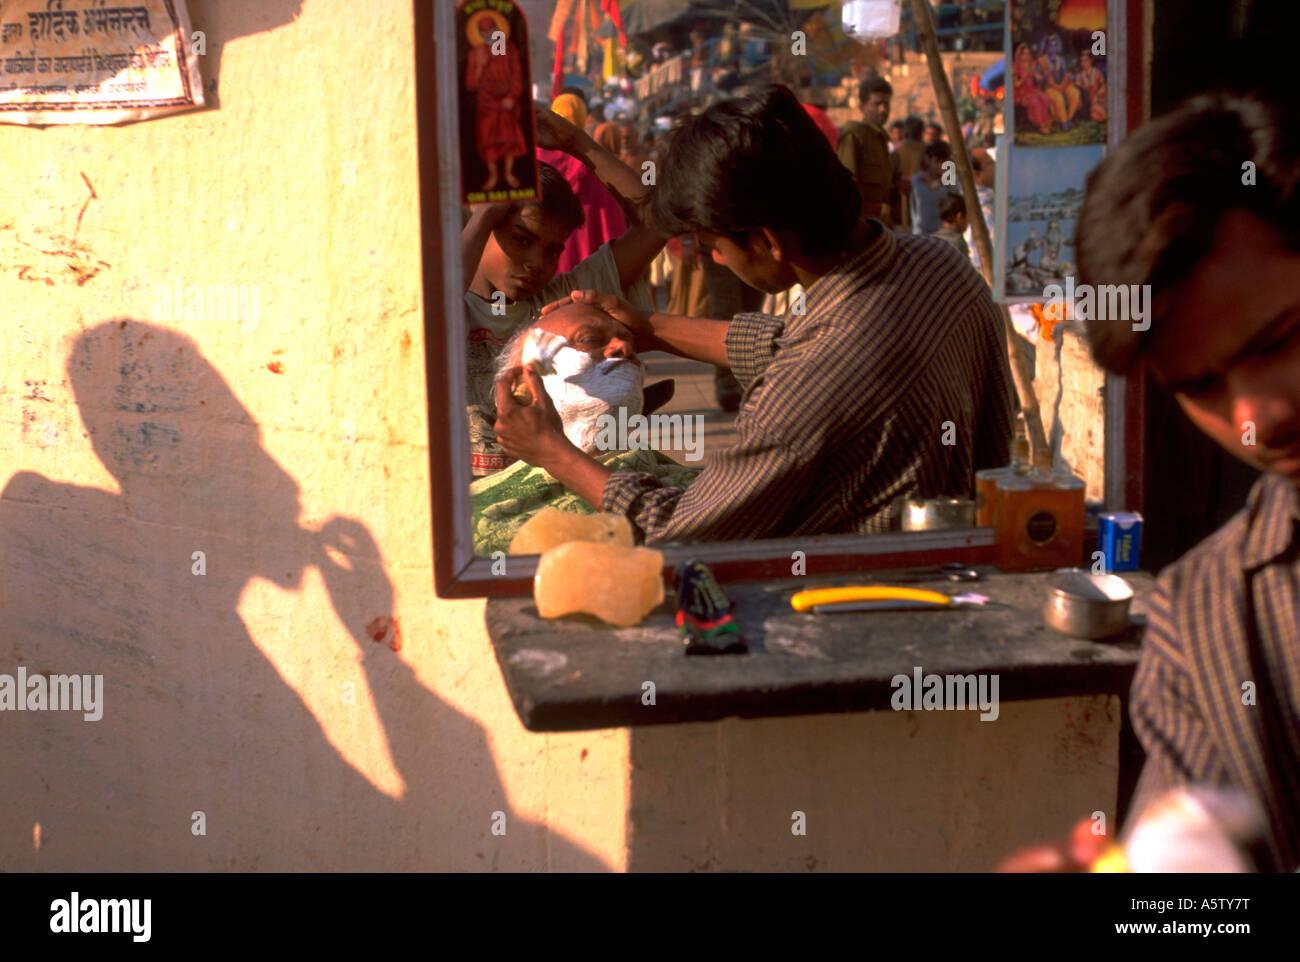 Painet hl1524 barber shop varanasi reflexion mirror hindu shaving client - Stock Image